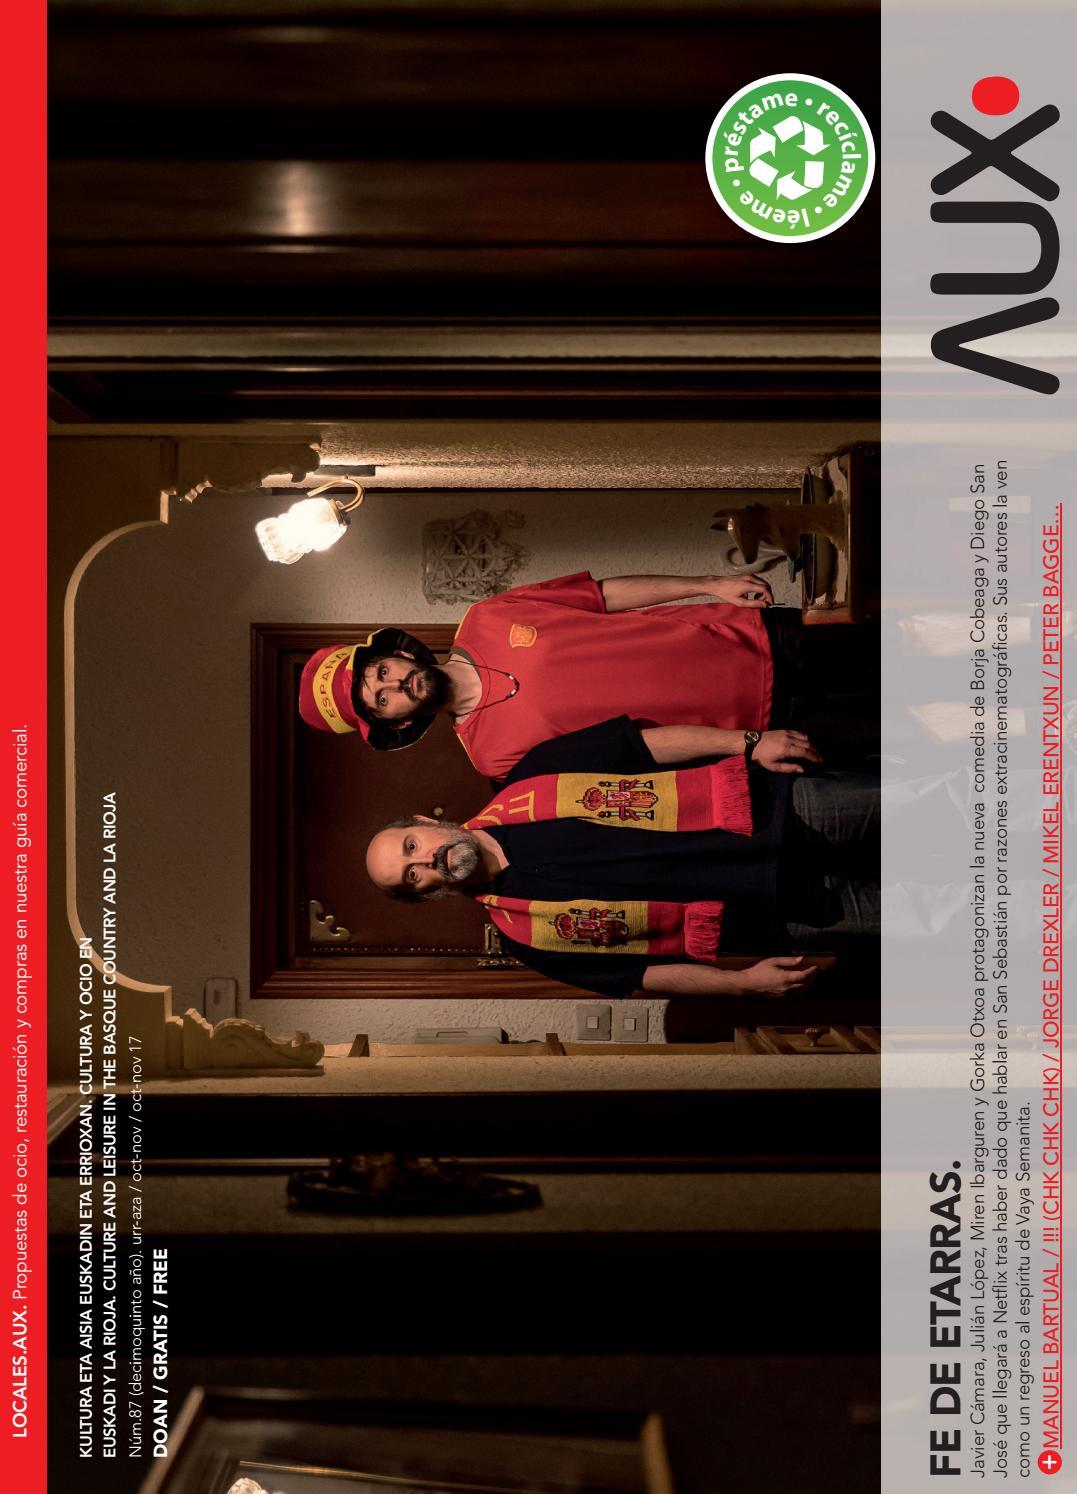 d0ea5e1ccf0 AUX.magazine nº 87 by Auxiliarte Factoría - issuu